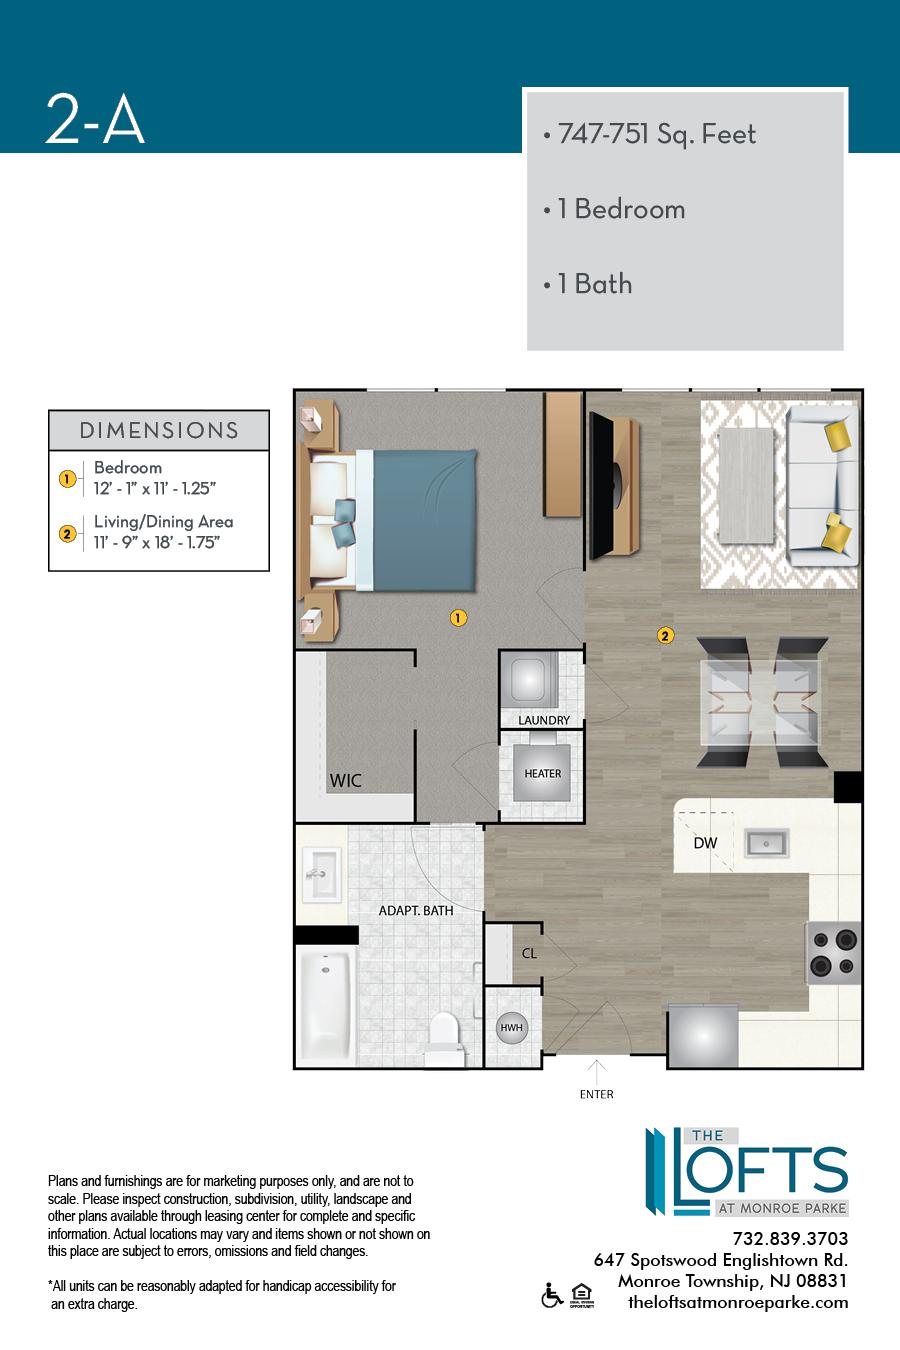 2-A Floor Plan